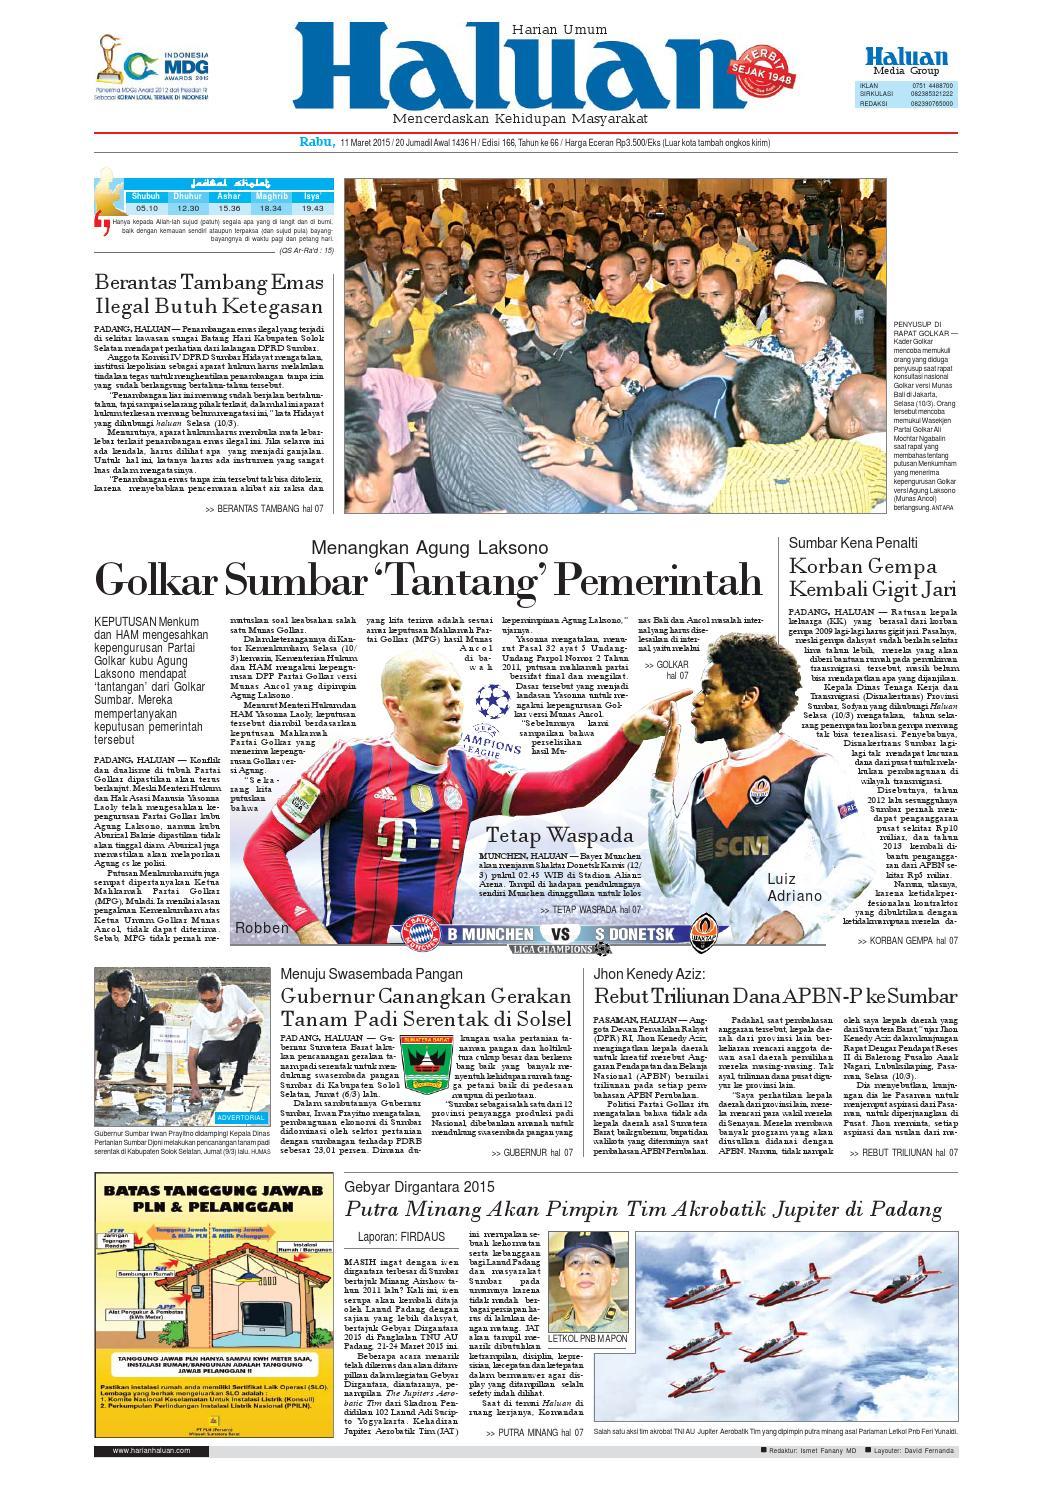 Haluan 11 Maret 2015 By Harian Issuu Cat Emas Pinang Padi